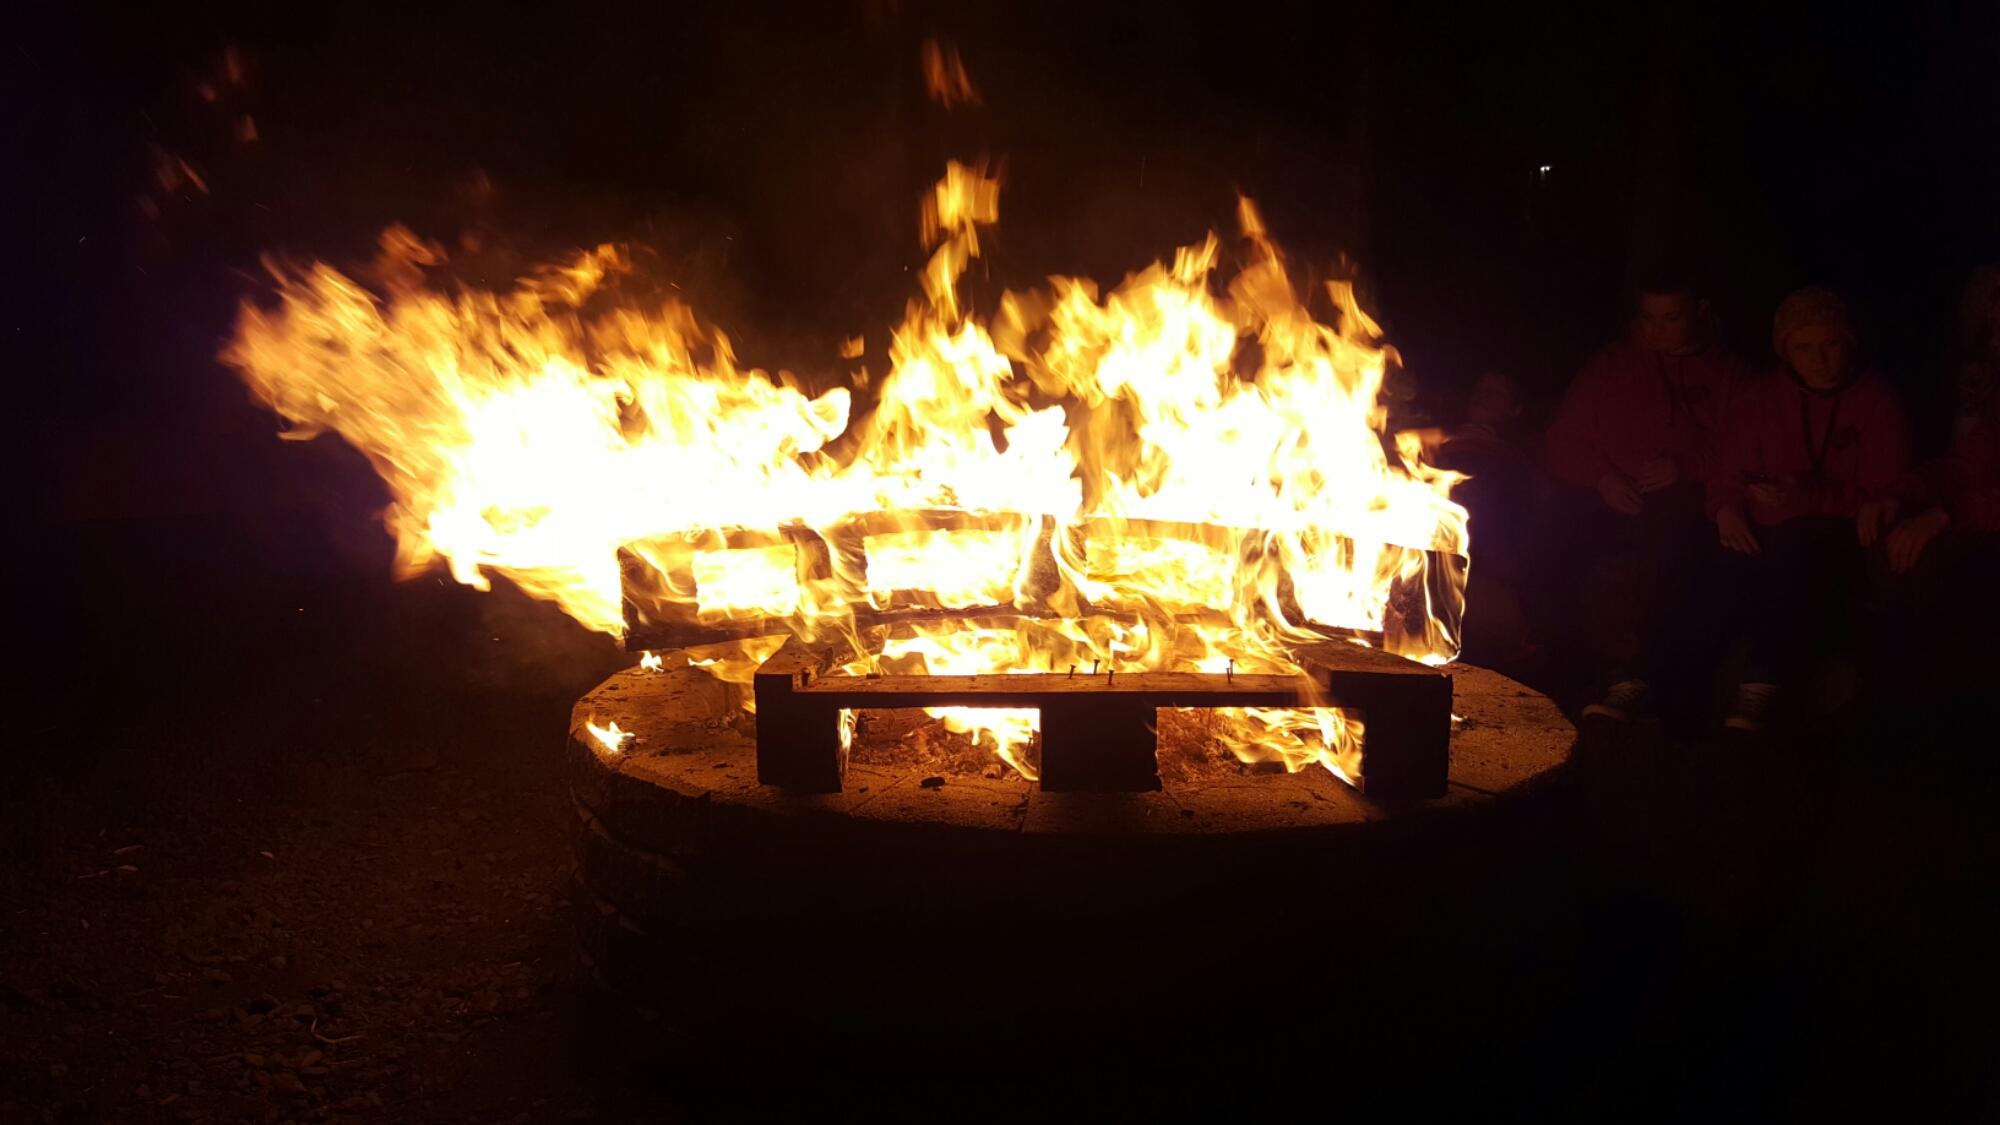 Last night's camp fire